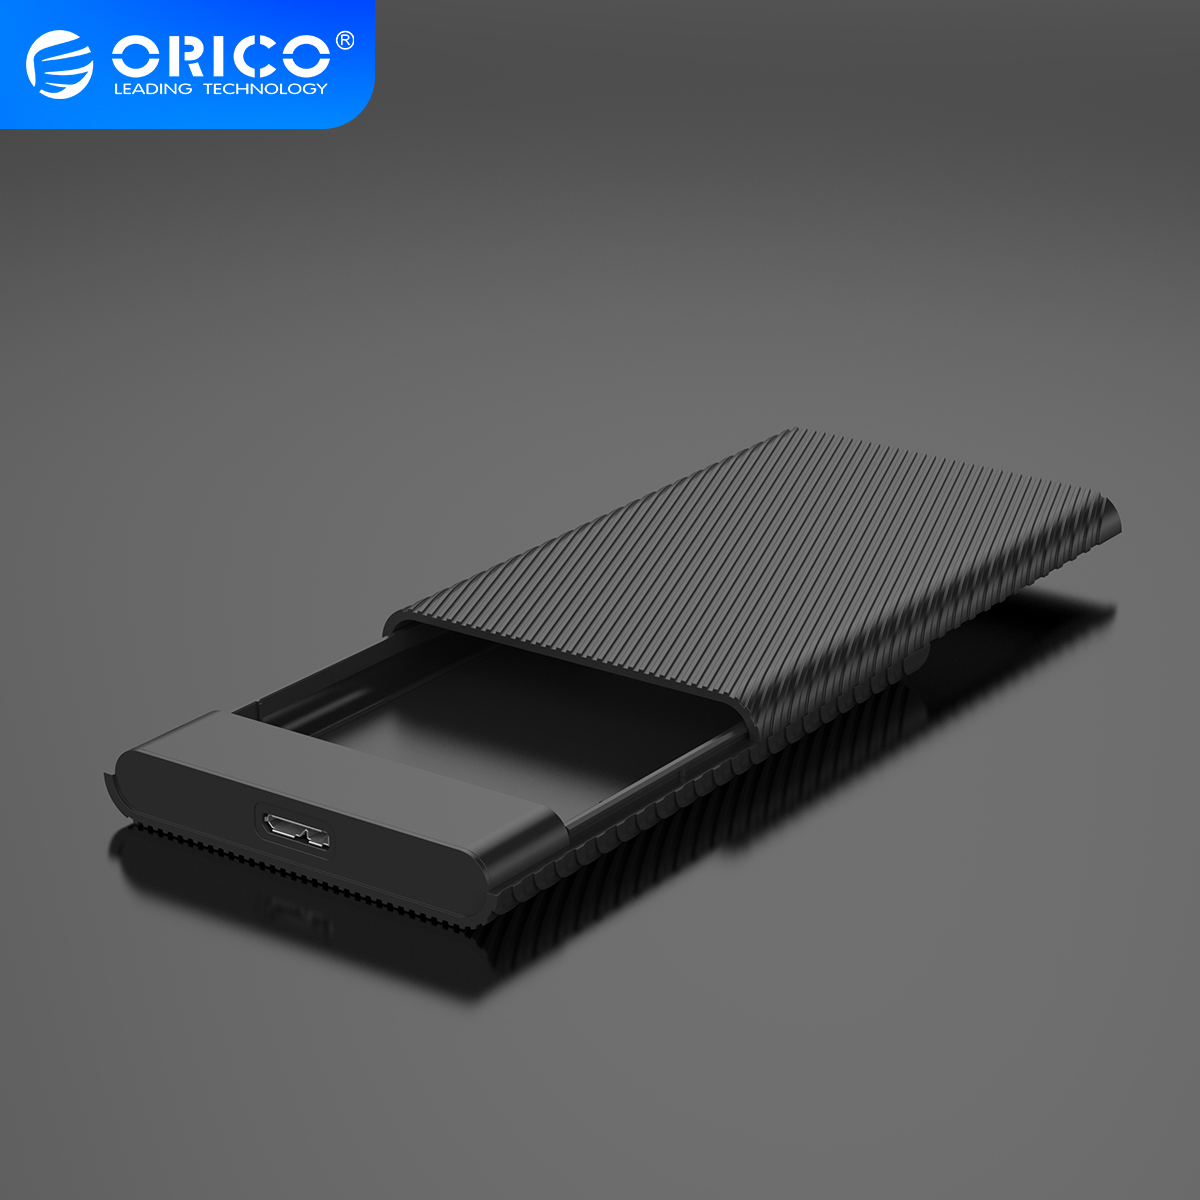 ORICO USB3.0 HDD SSD адаптер 2,5 дюймов внешний HDD чехол 5 Гбит/с HDD корпус с функцией автоматического сна UASP